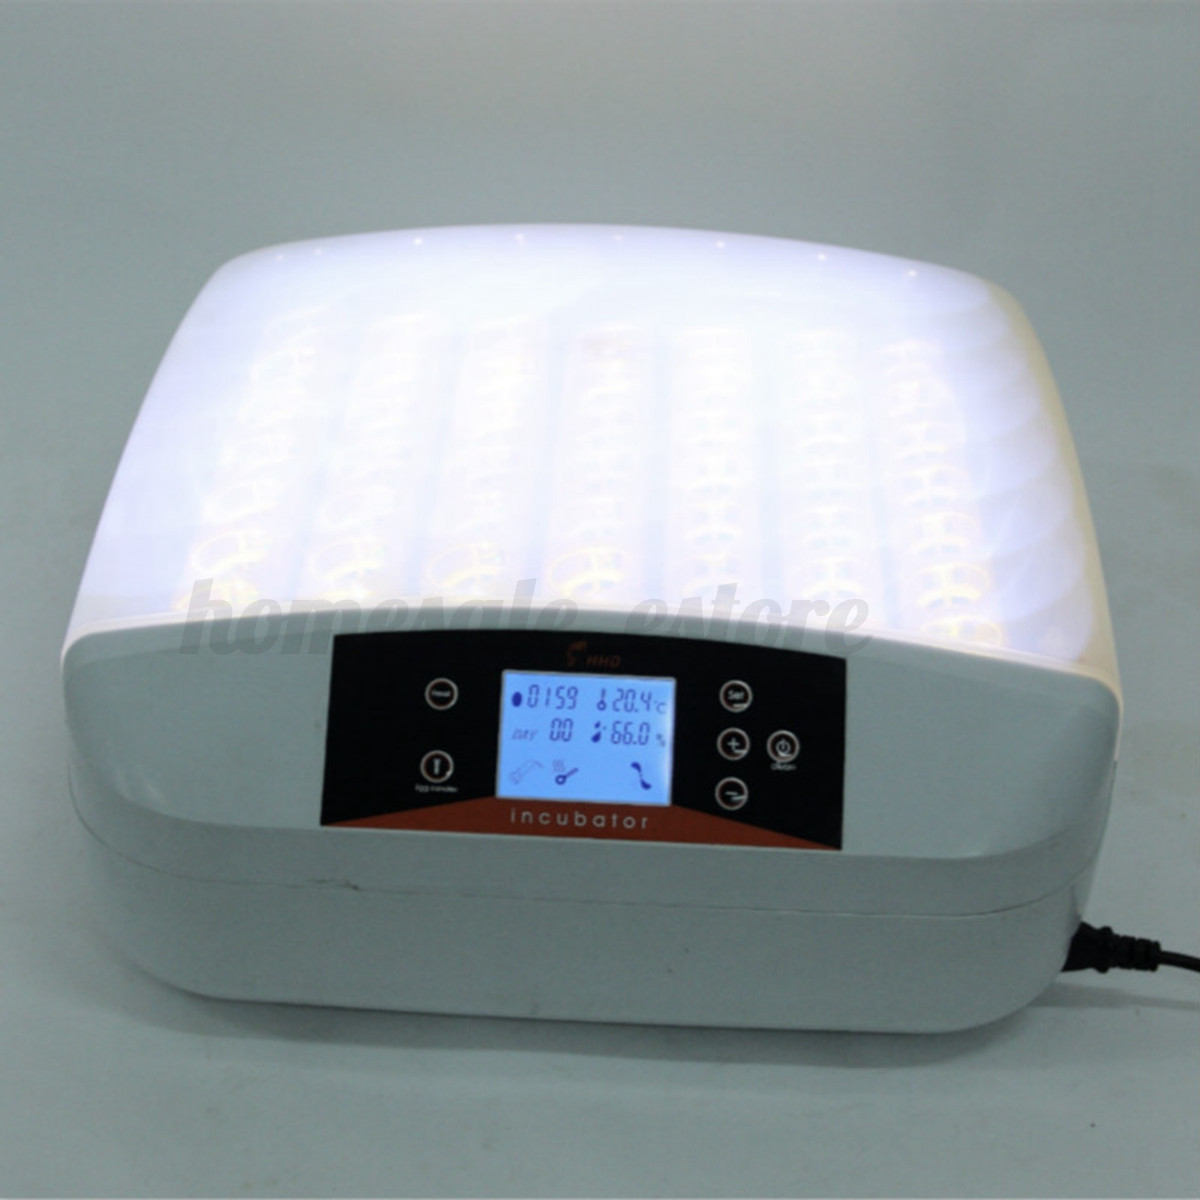 New Clear Egg Incubator Hatcher 56 Digital Temperature Control  #1D59AE